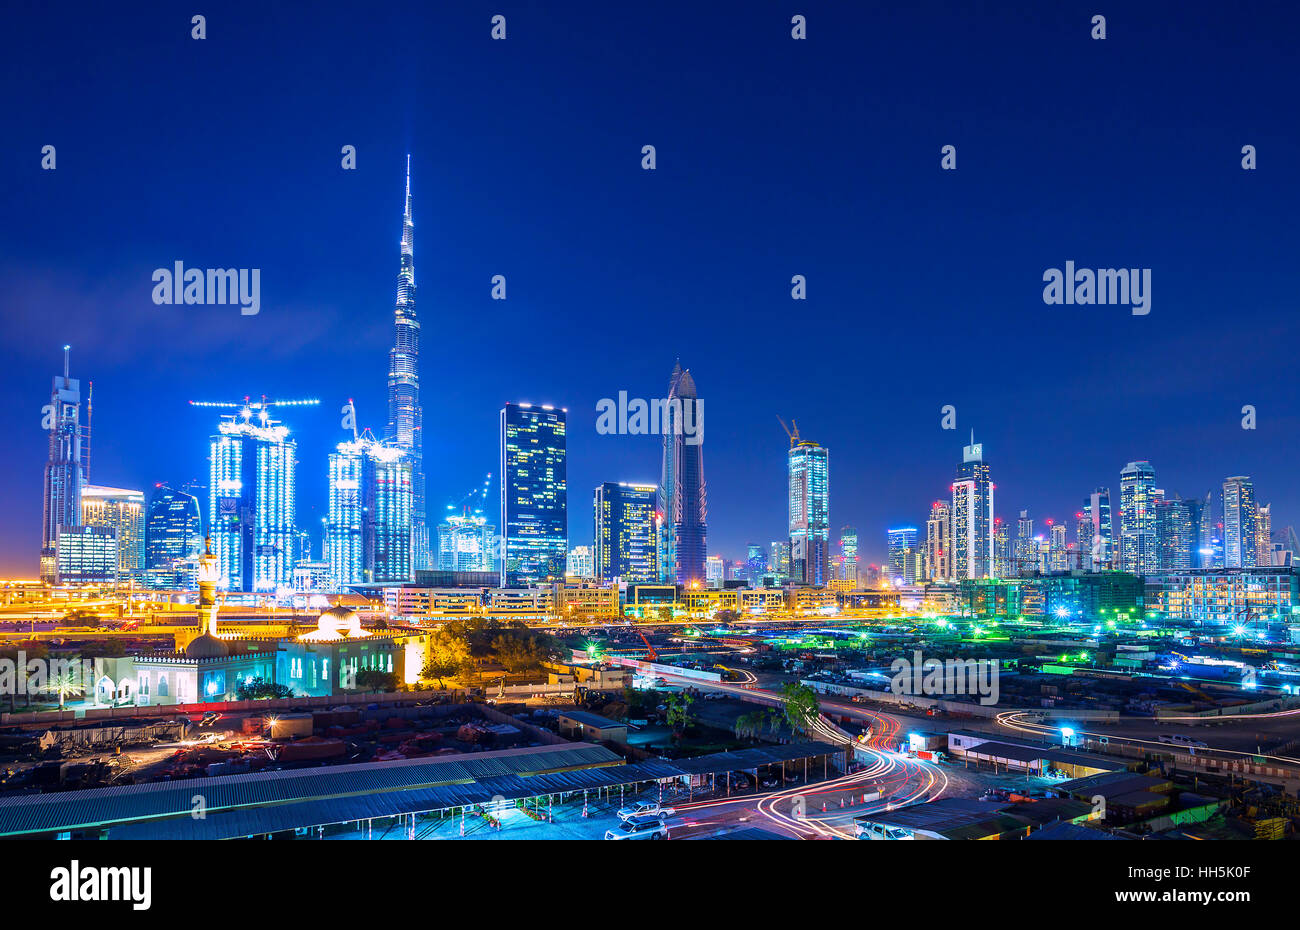 Centro financiero de Dubai, Emiratos Árabes Unidos De febrero 28, 2016: Ver en el horizonte de Dubai Financial Center Foto de stock